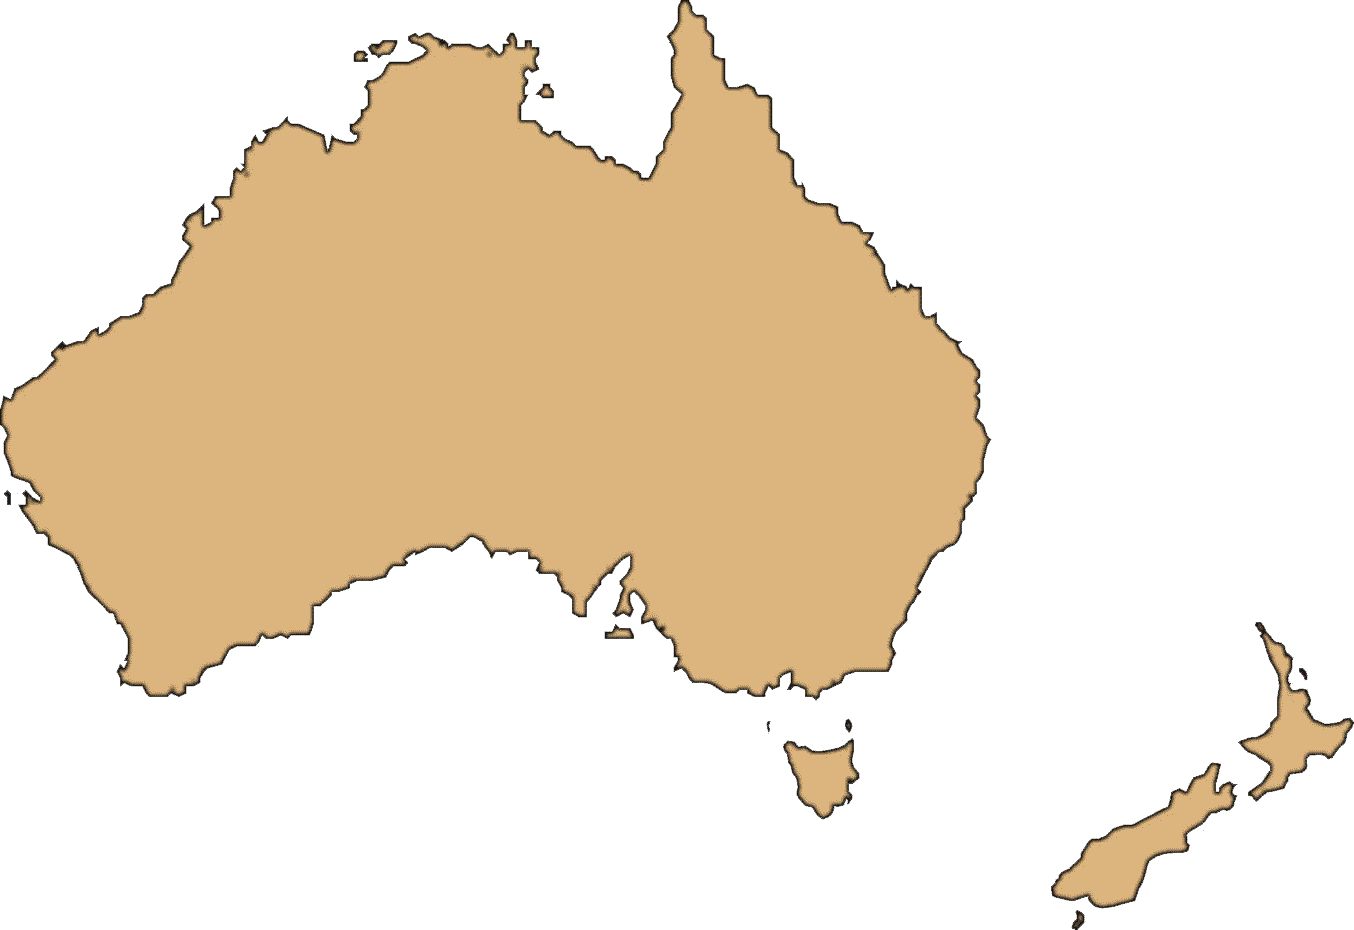 Download Australia Map Transparent Background Hq Png Image